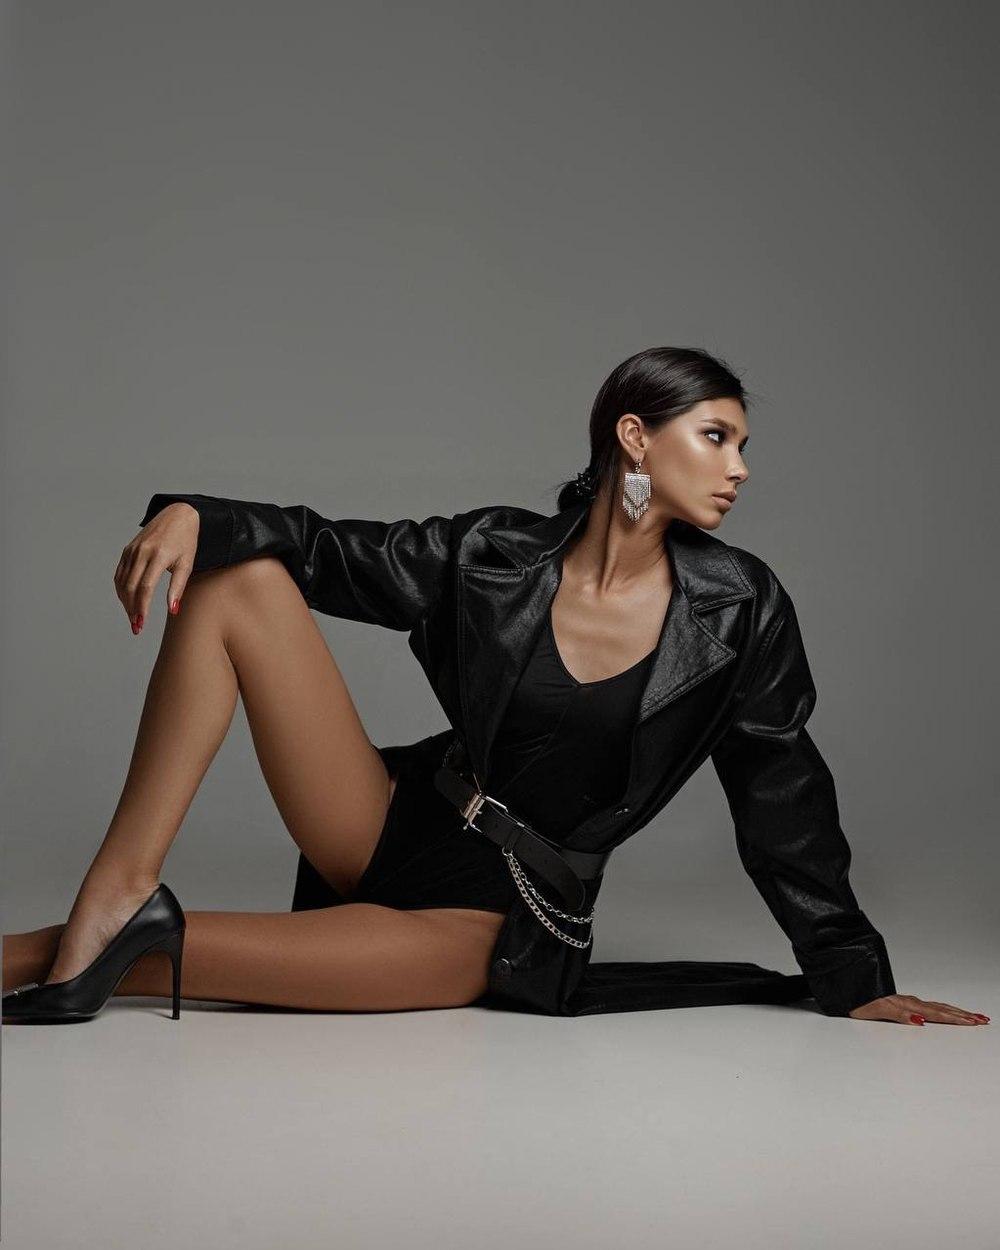 ELIZAVETA R